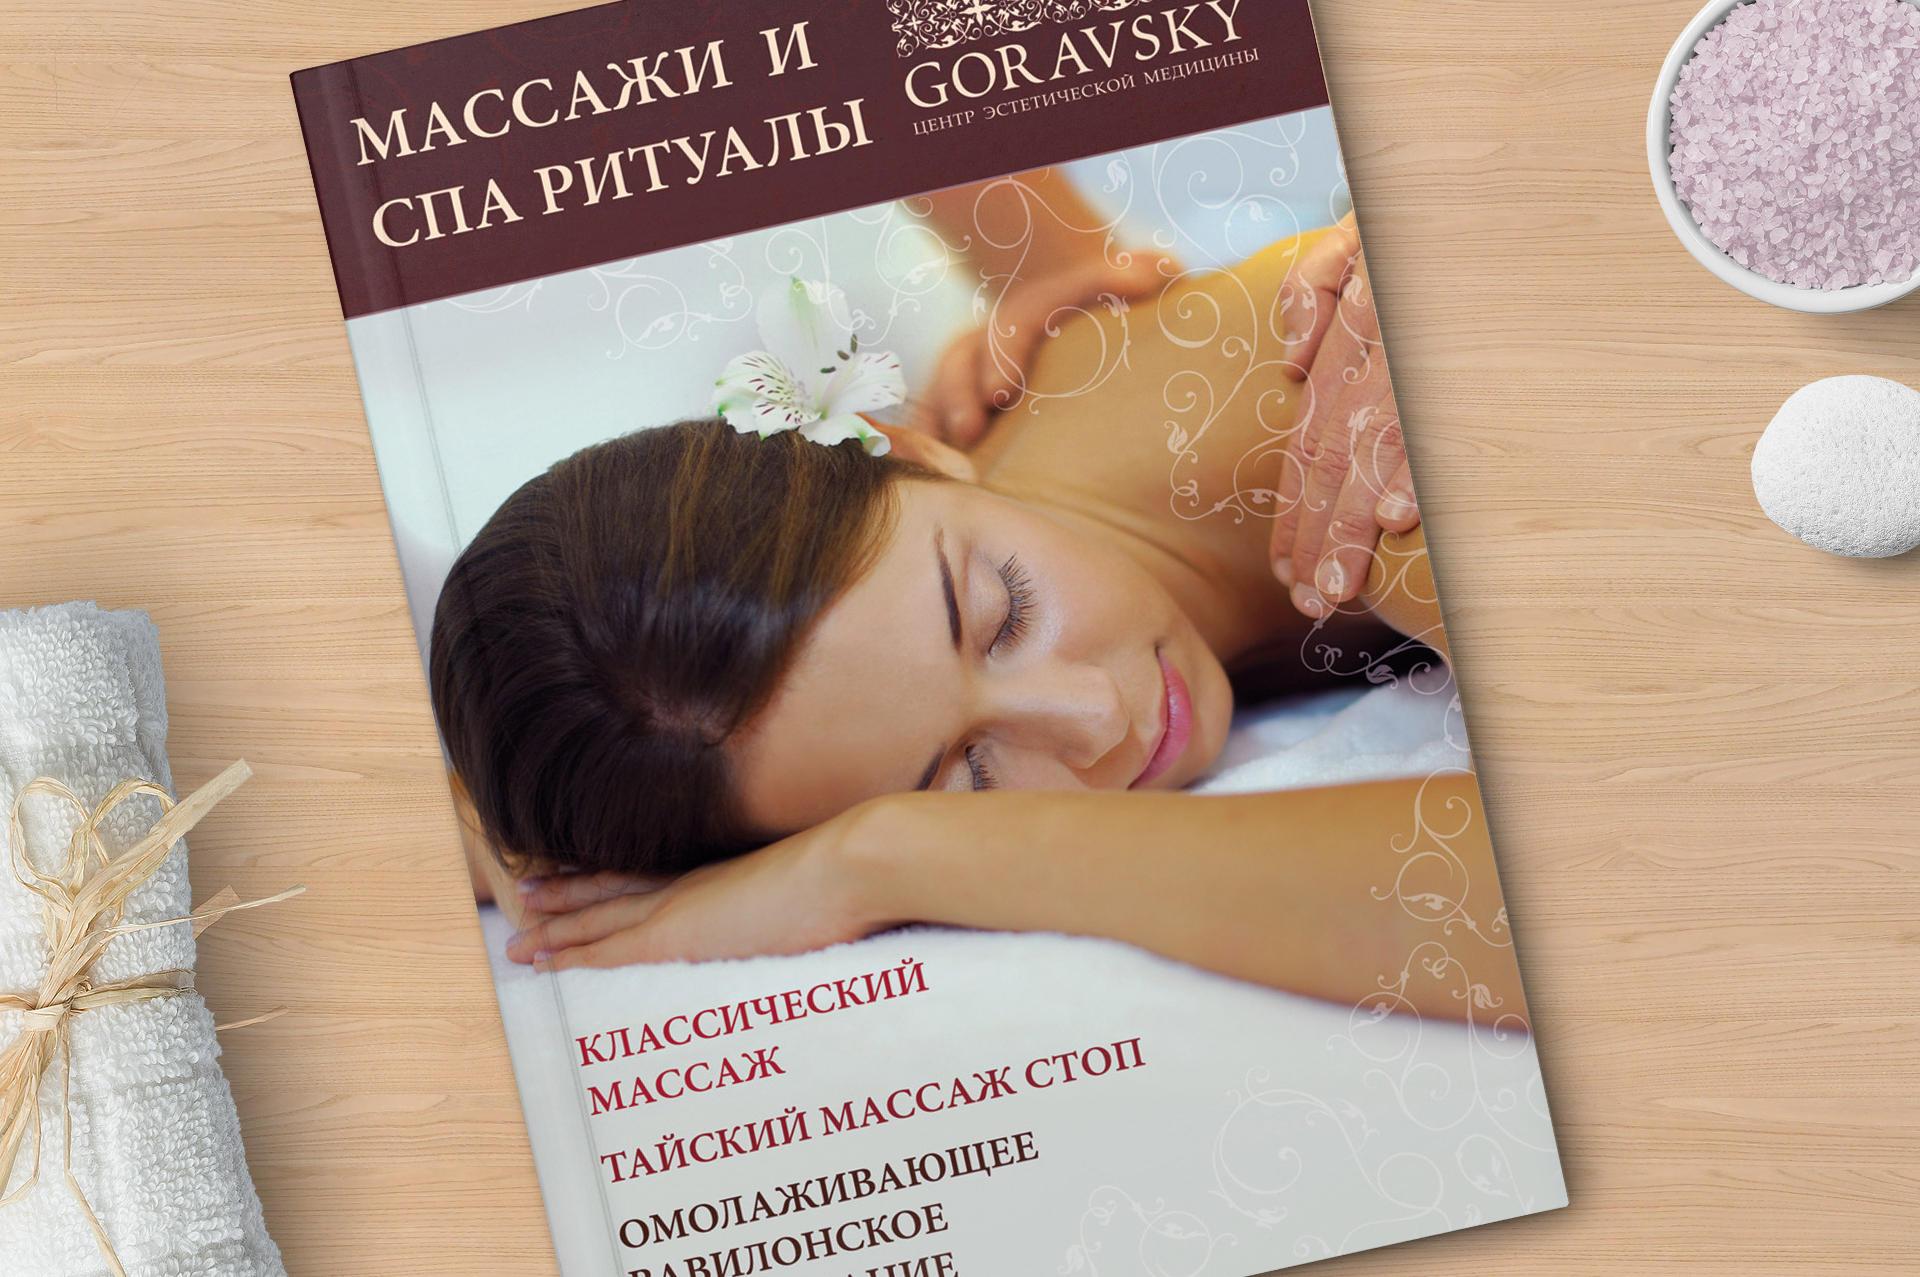 Дизайн журнала of the medical center, Medical center magazine design